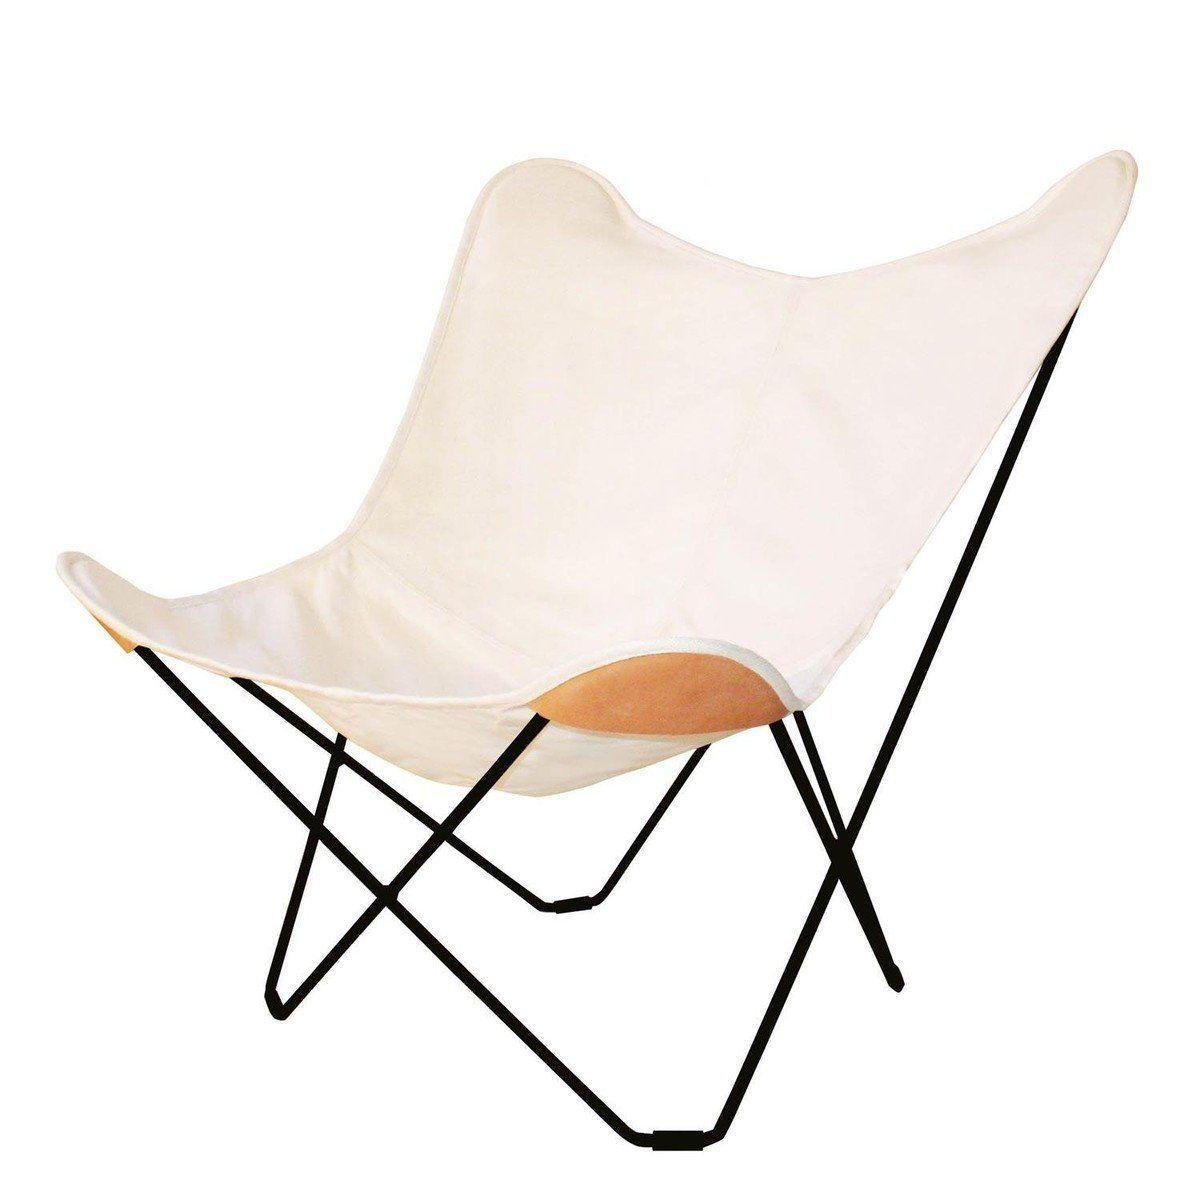 Wonderful Cuero   Canvas Mariposa Butterfly Chair Outdoor   White/Hemp ...